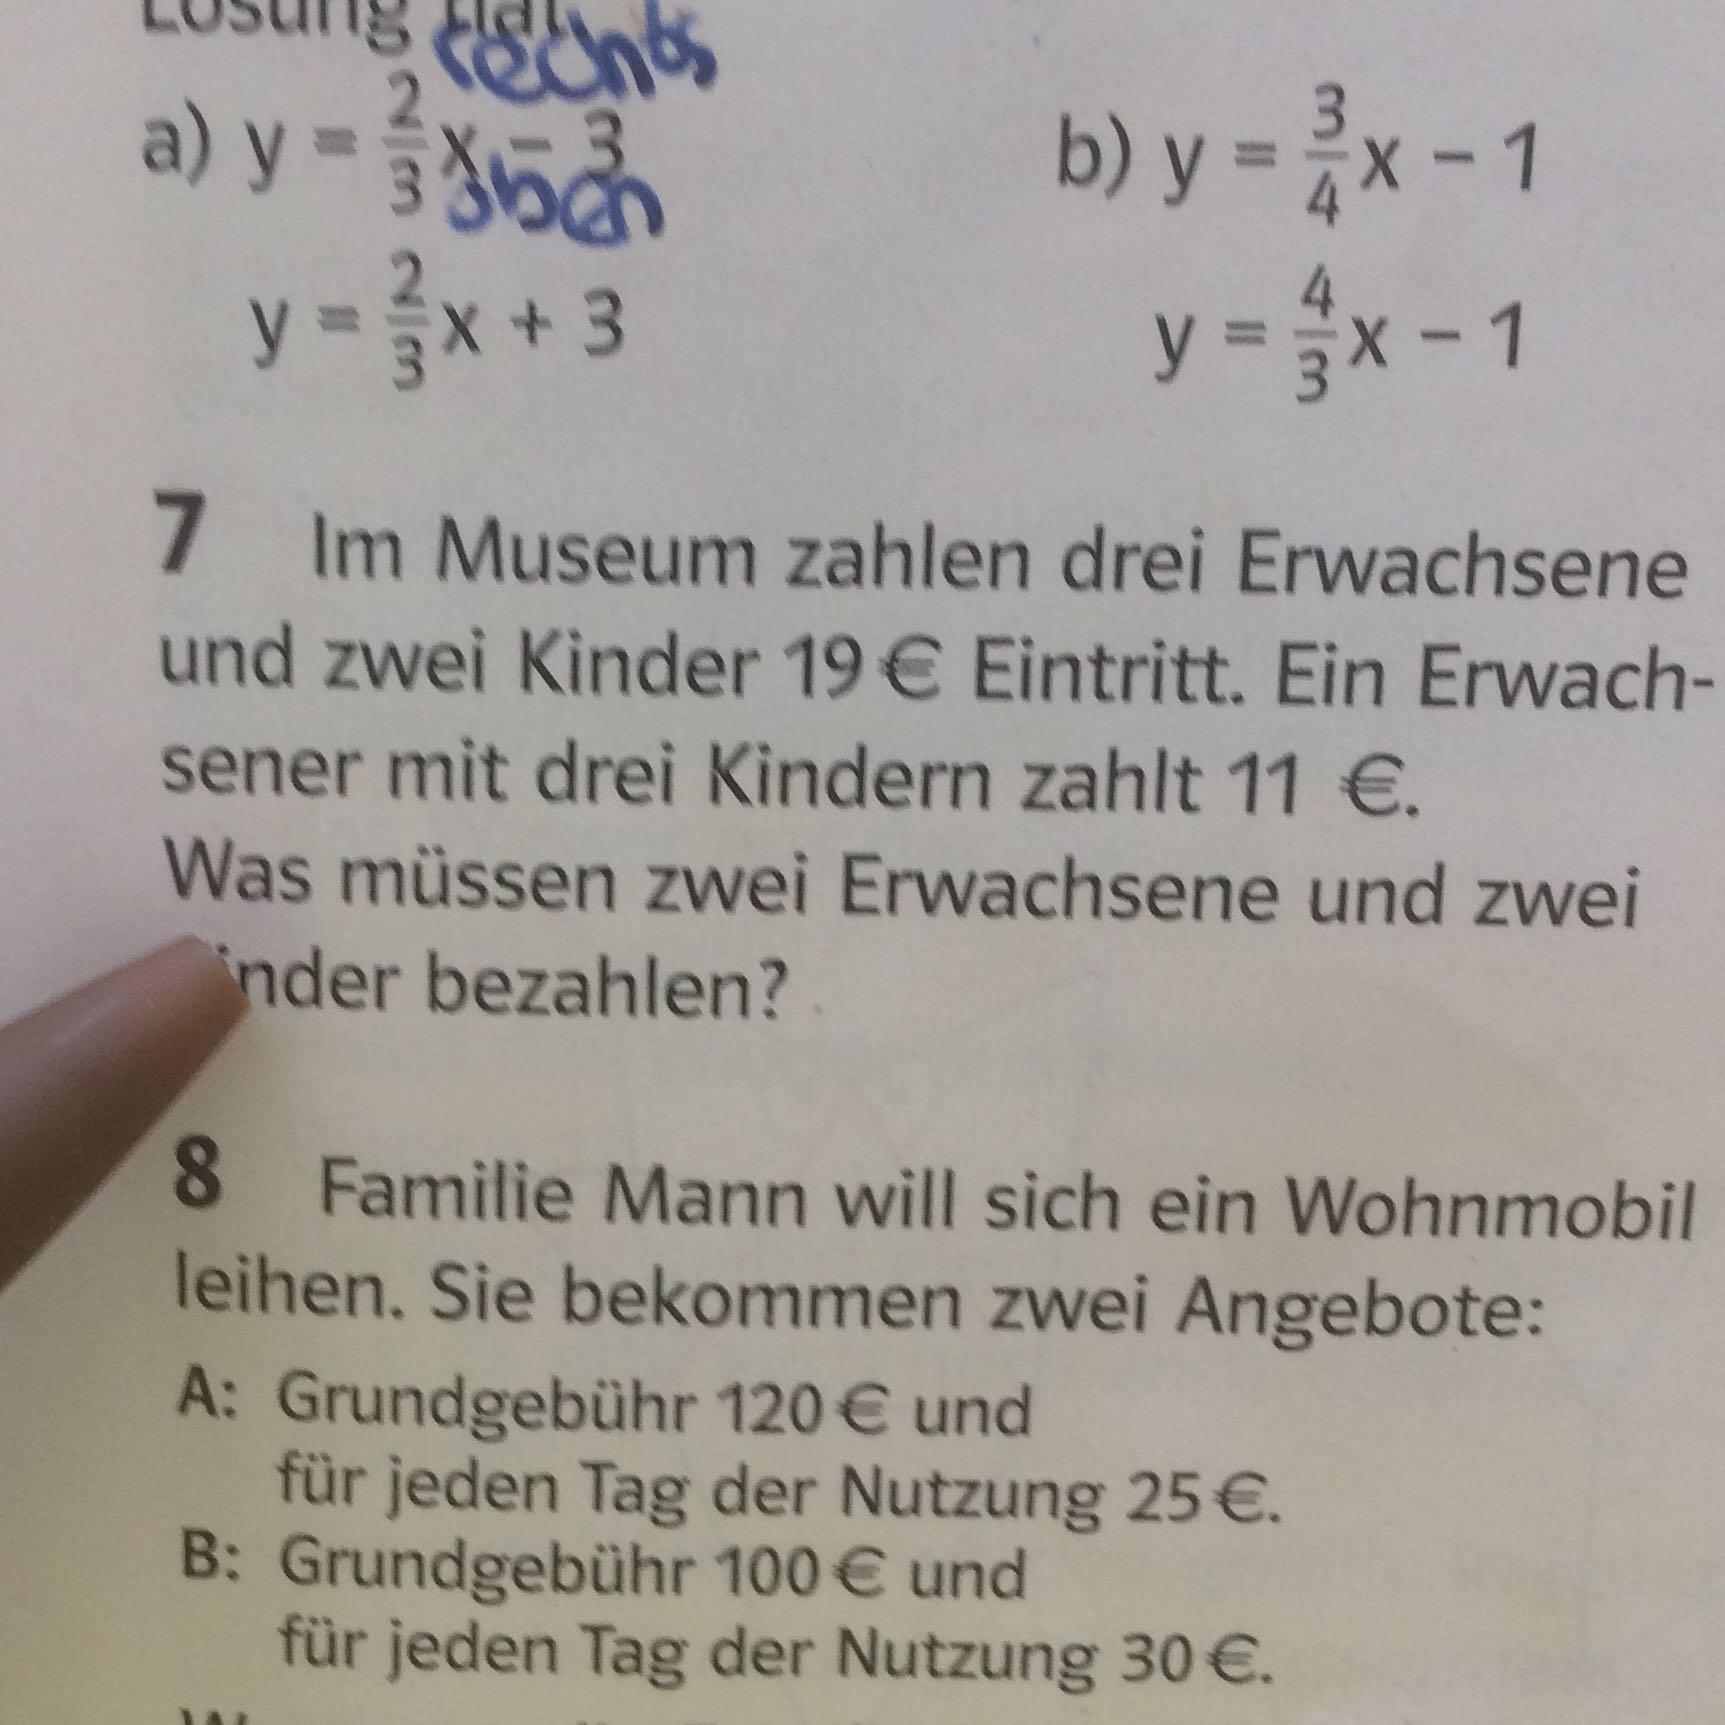 Mathe Rückspiegel Textaufgabe? (Mathematik)